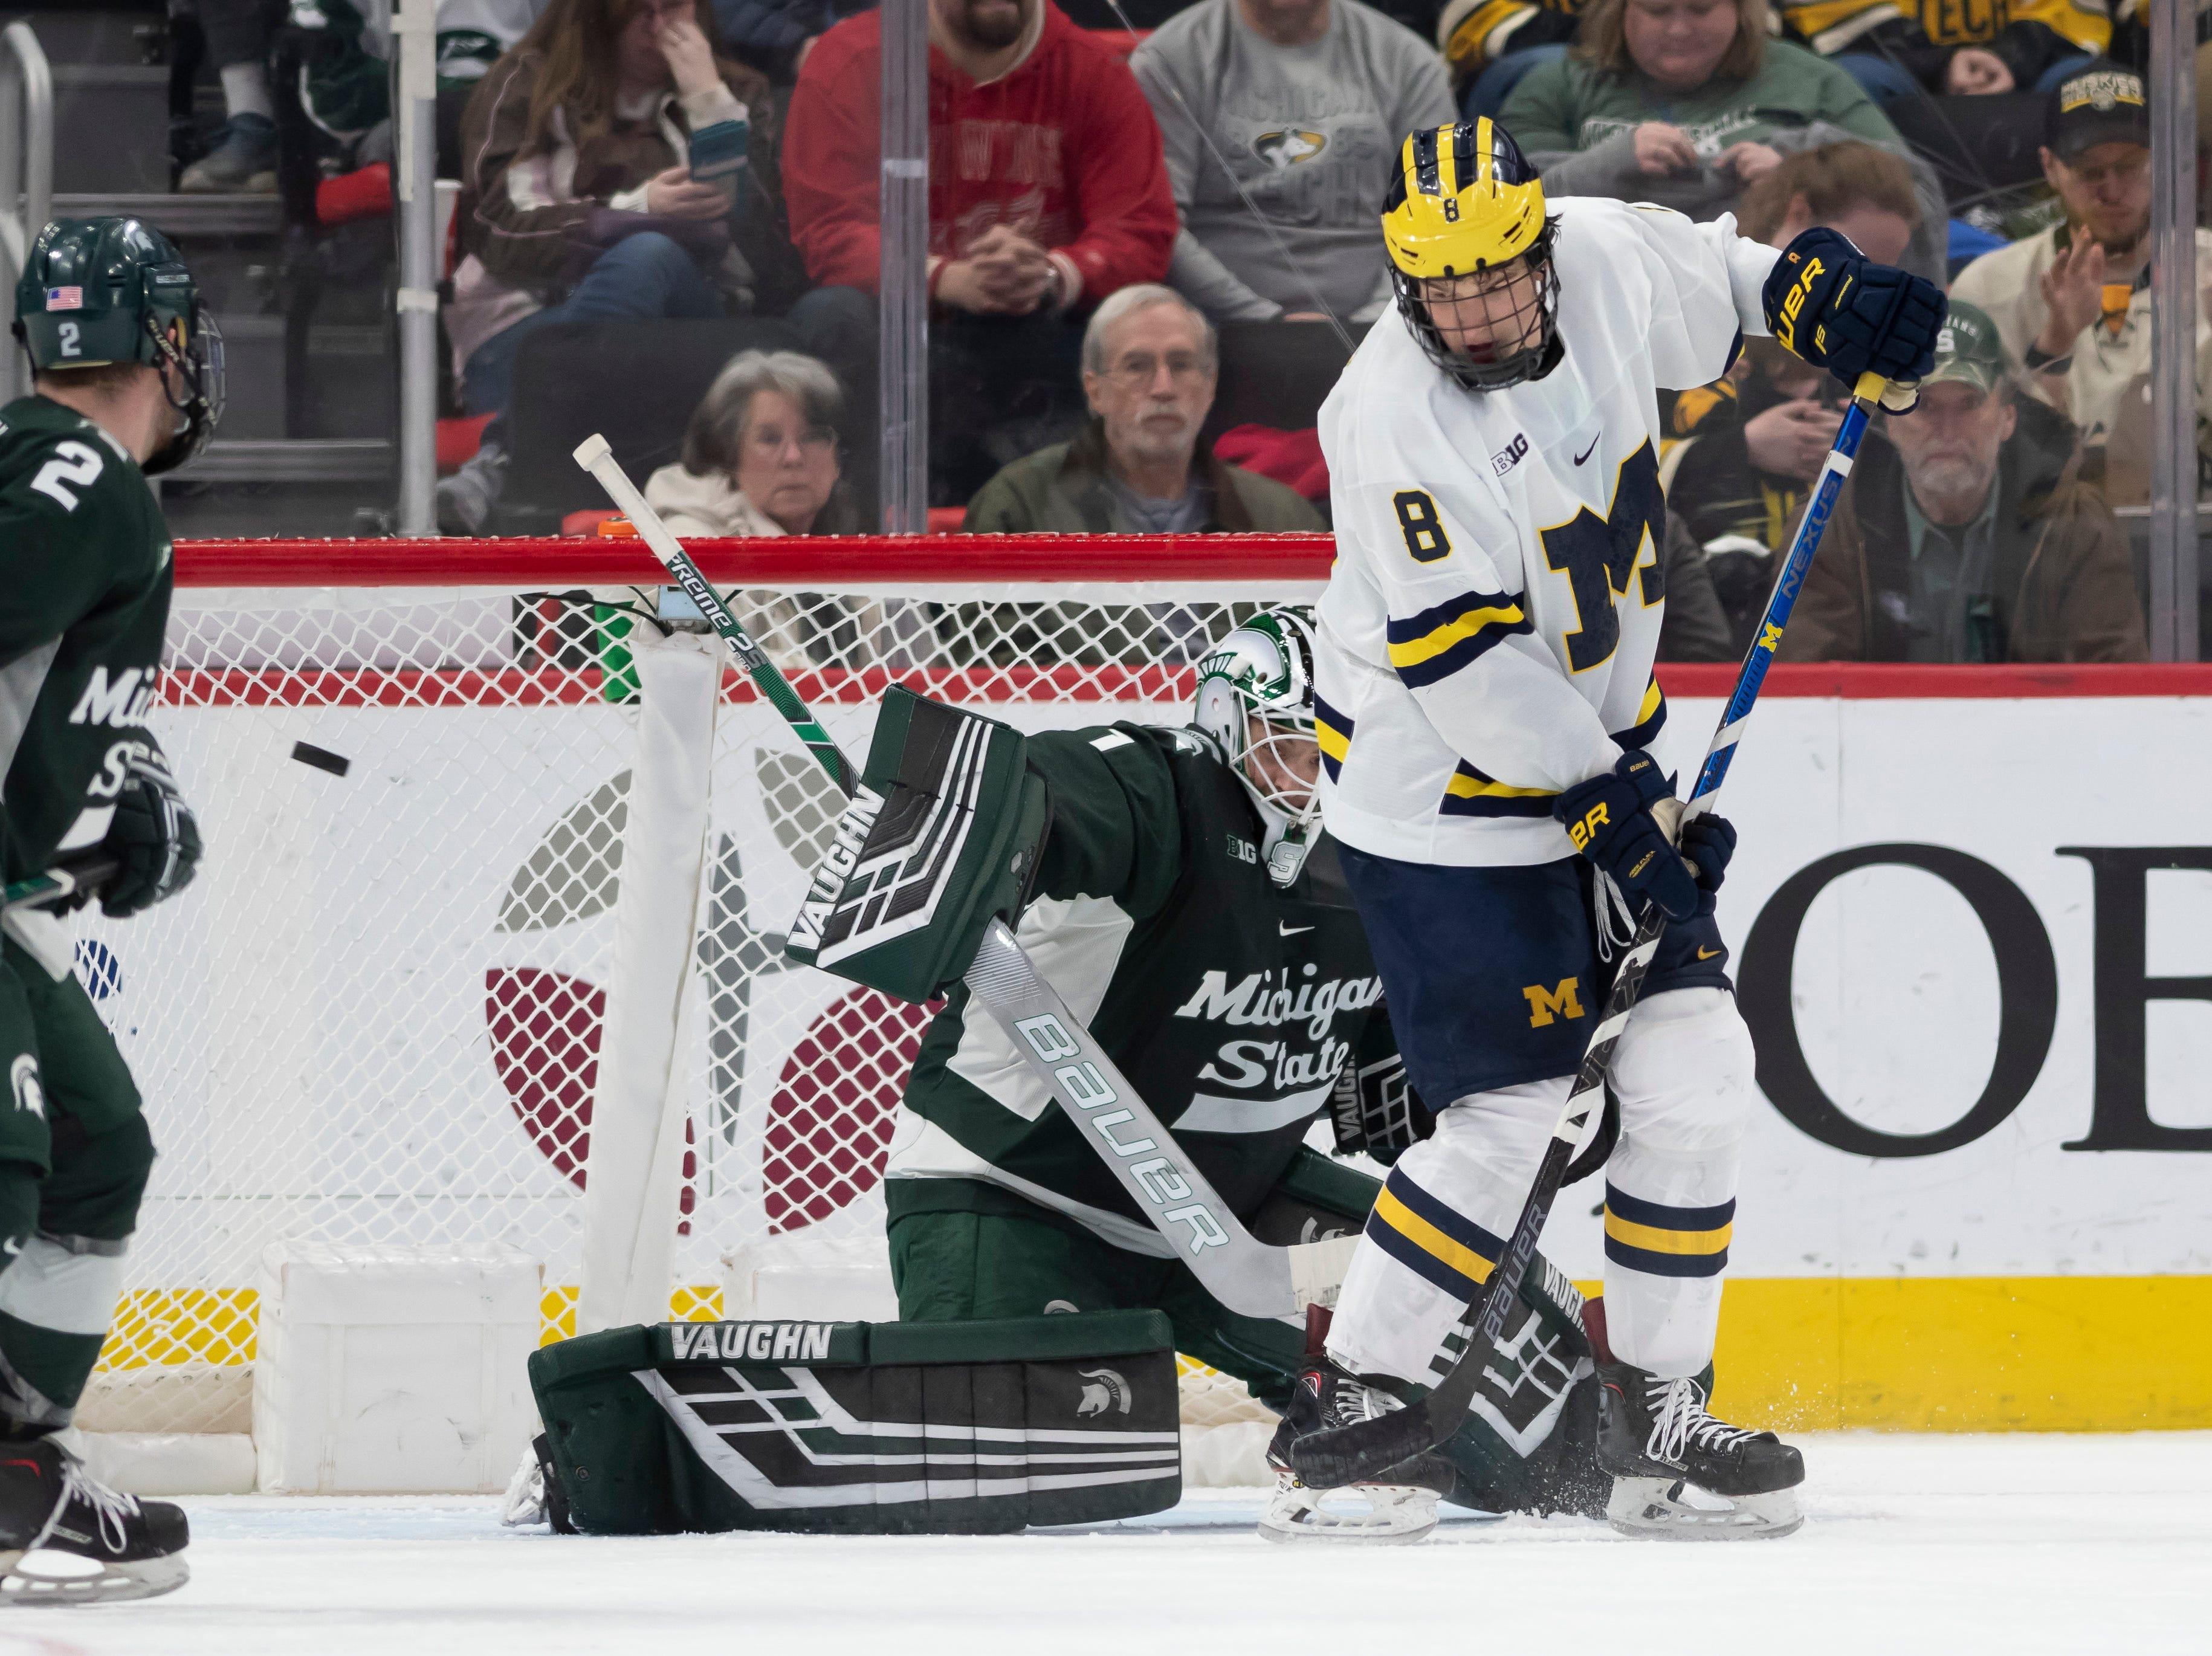 Michigan forward Jack Becker tries to deflect the puck past Michigan State goaltender Drew DeRidder in the second period.